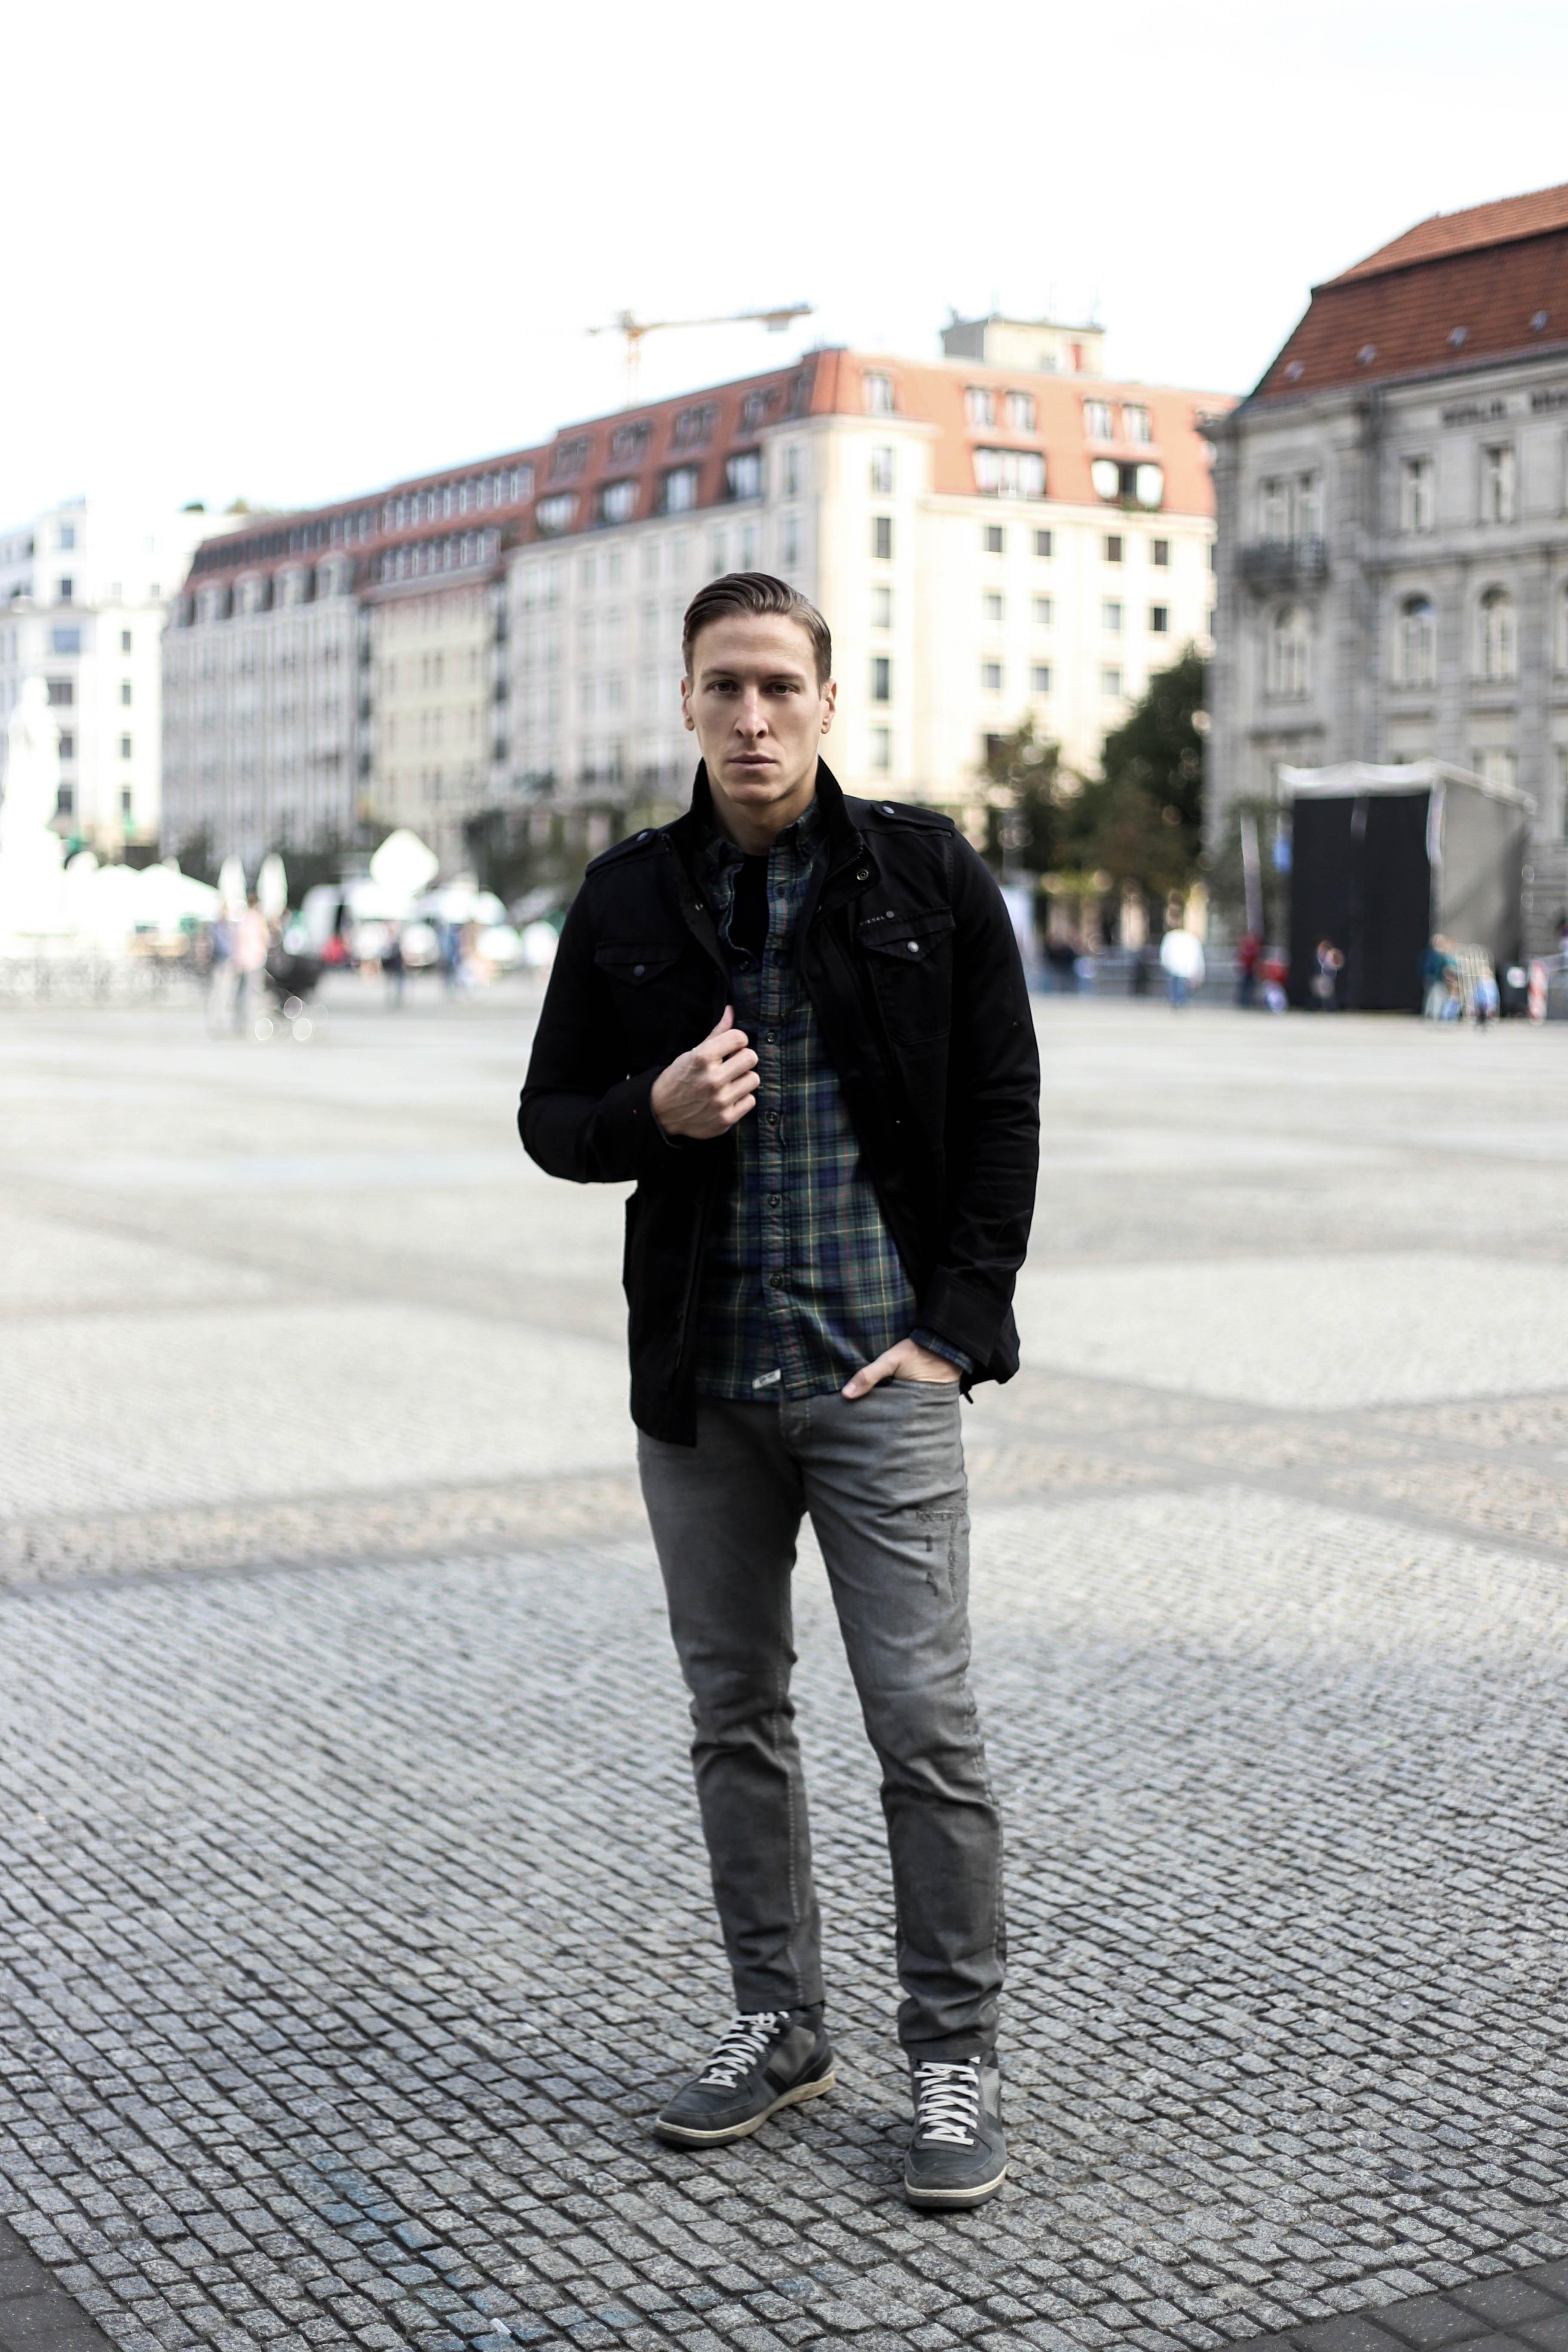 kariertes-hemd-maennerblog-fashionblog-berlin-outfit-graue-jeans_4040